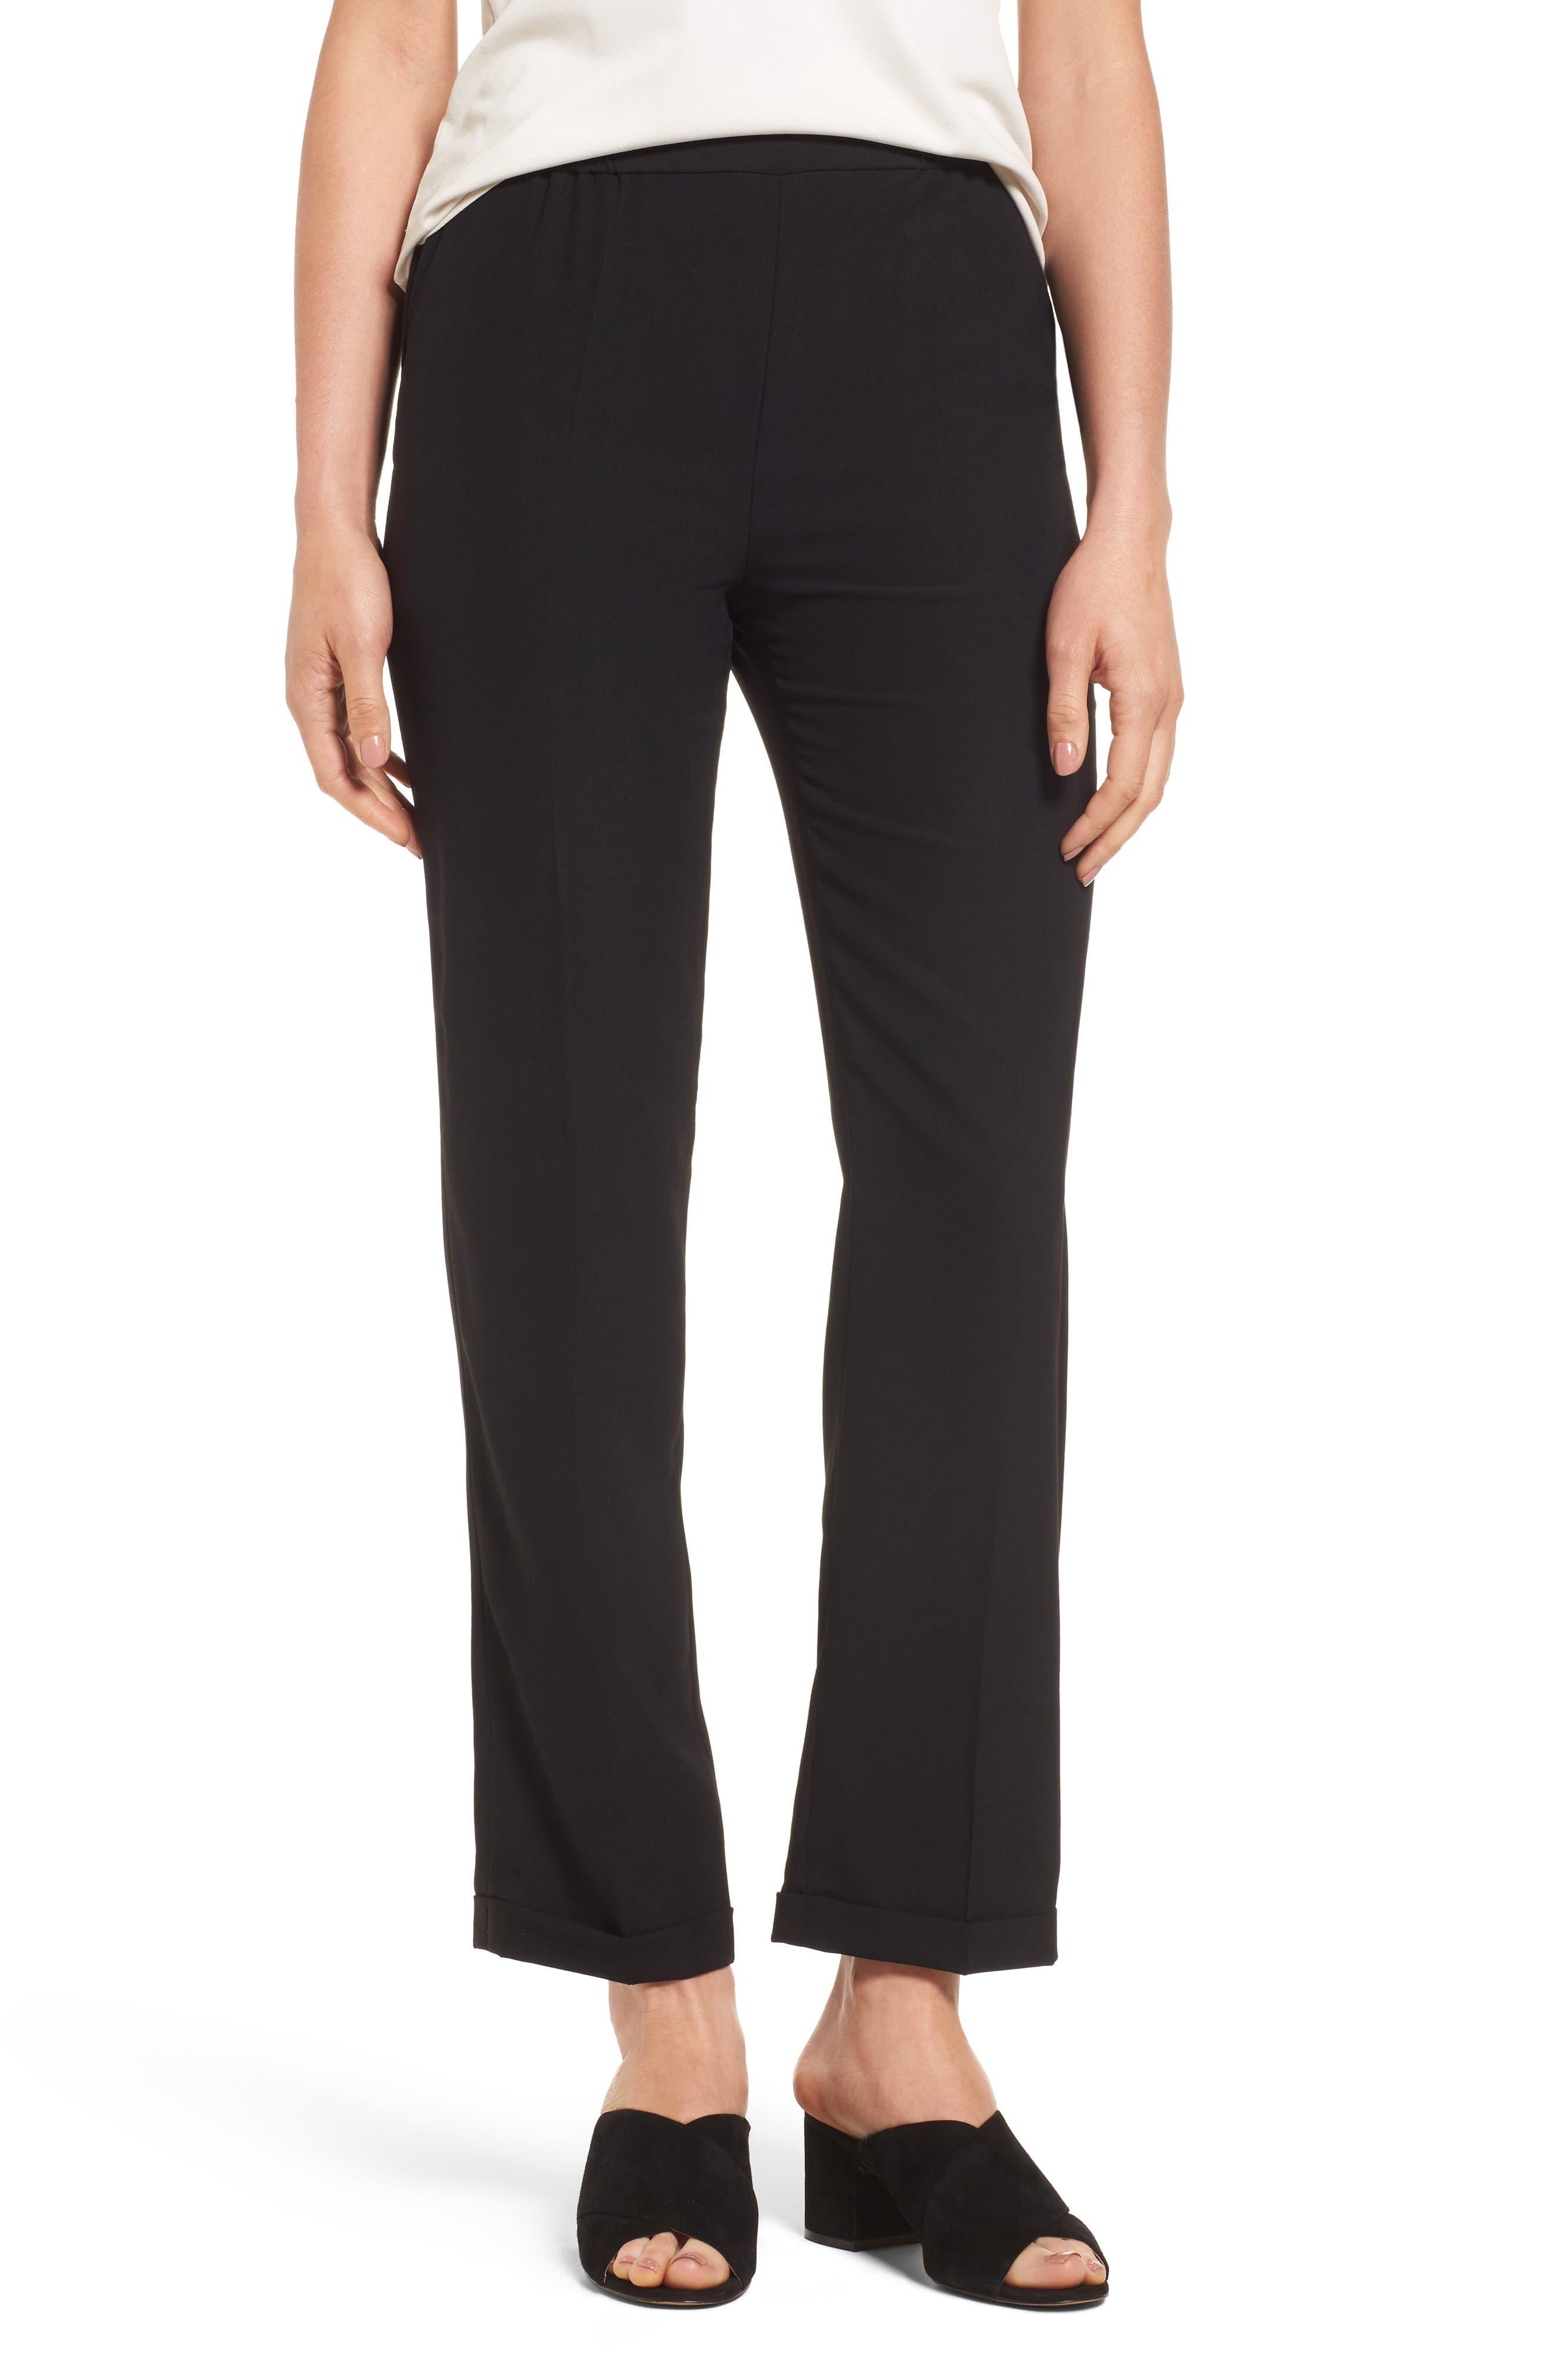 Soft Swing Pants,                         Main,                         color, Black Onyx